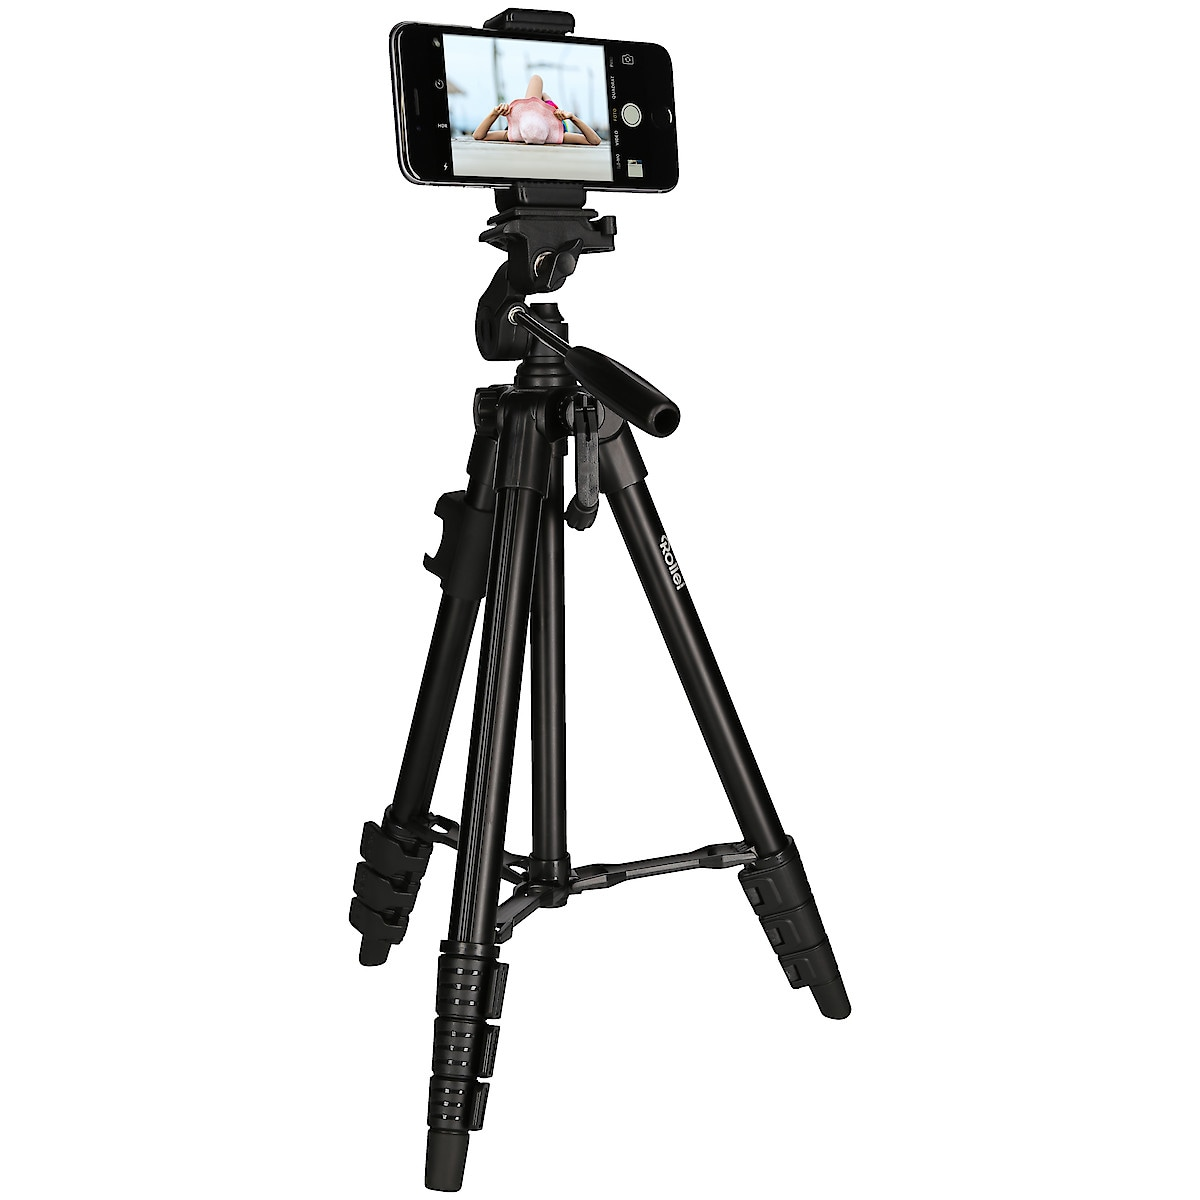 Kamerastativ Rollei Smartphone Tripod Traveler